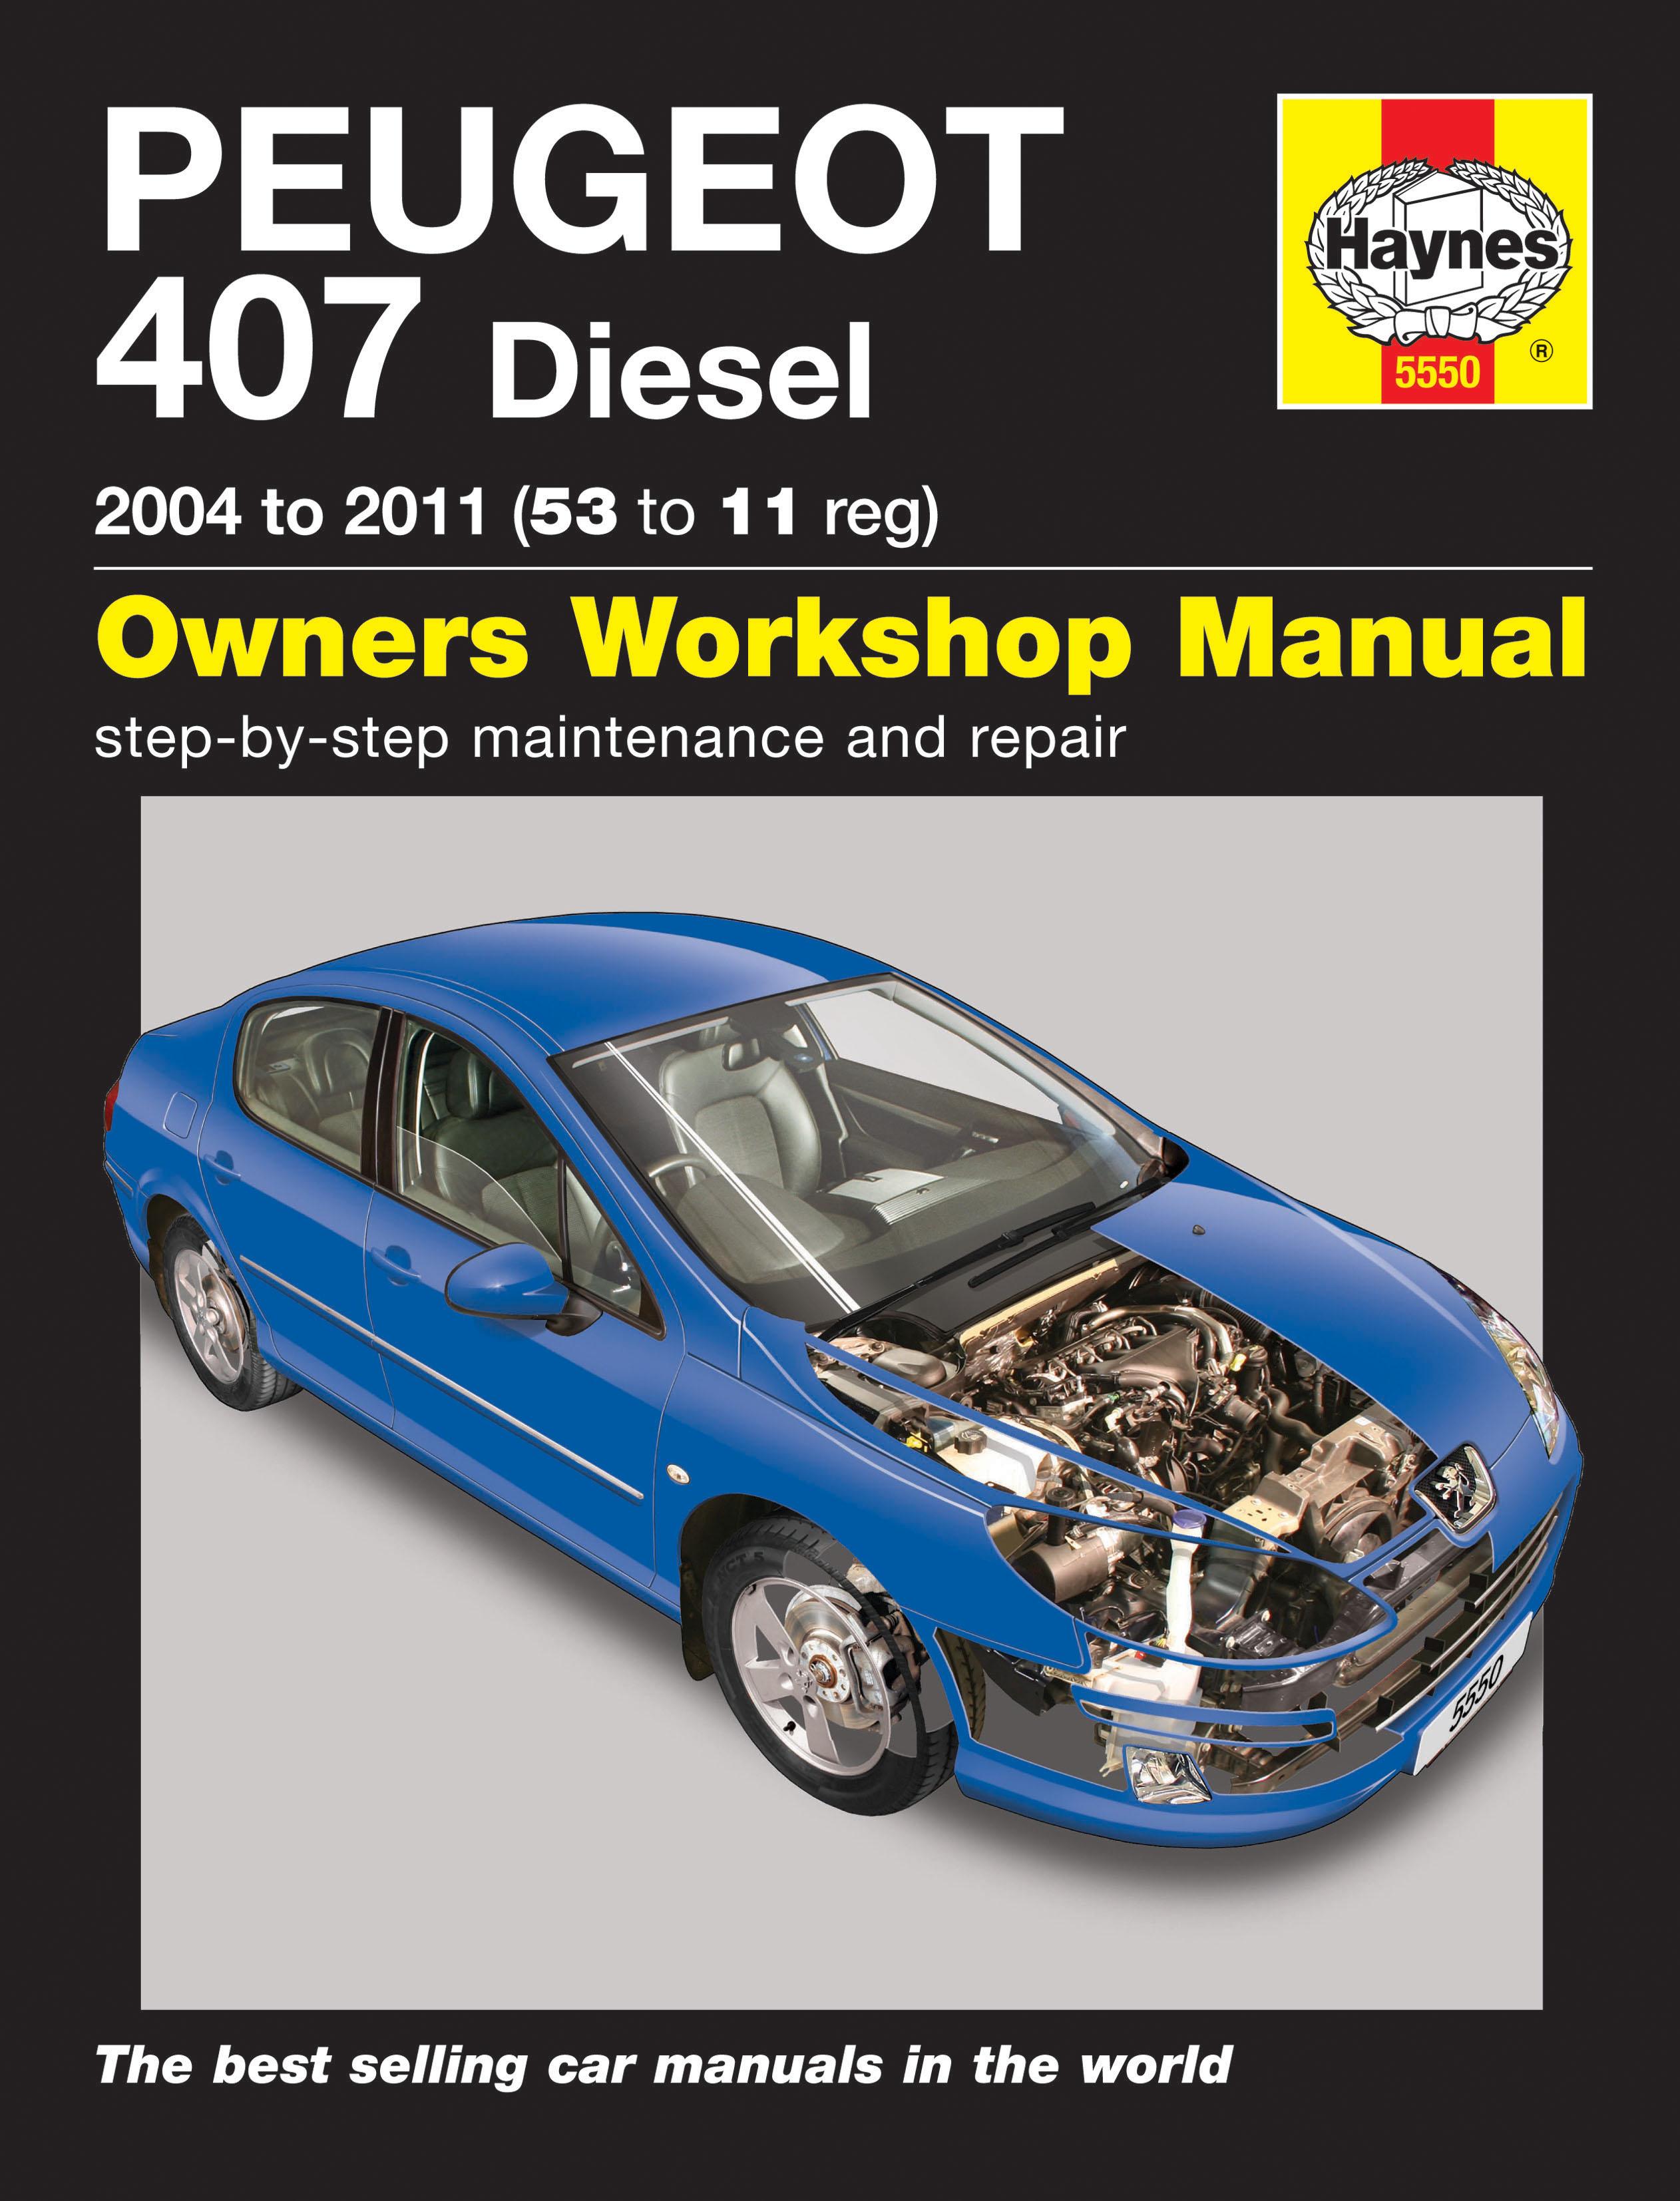 Peugeot 407 workshop manual